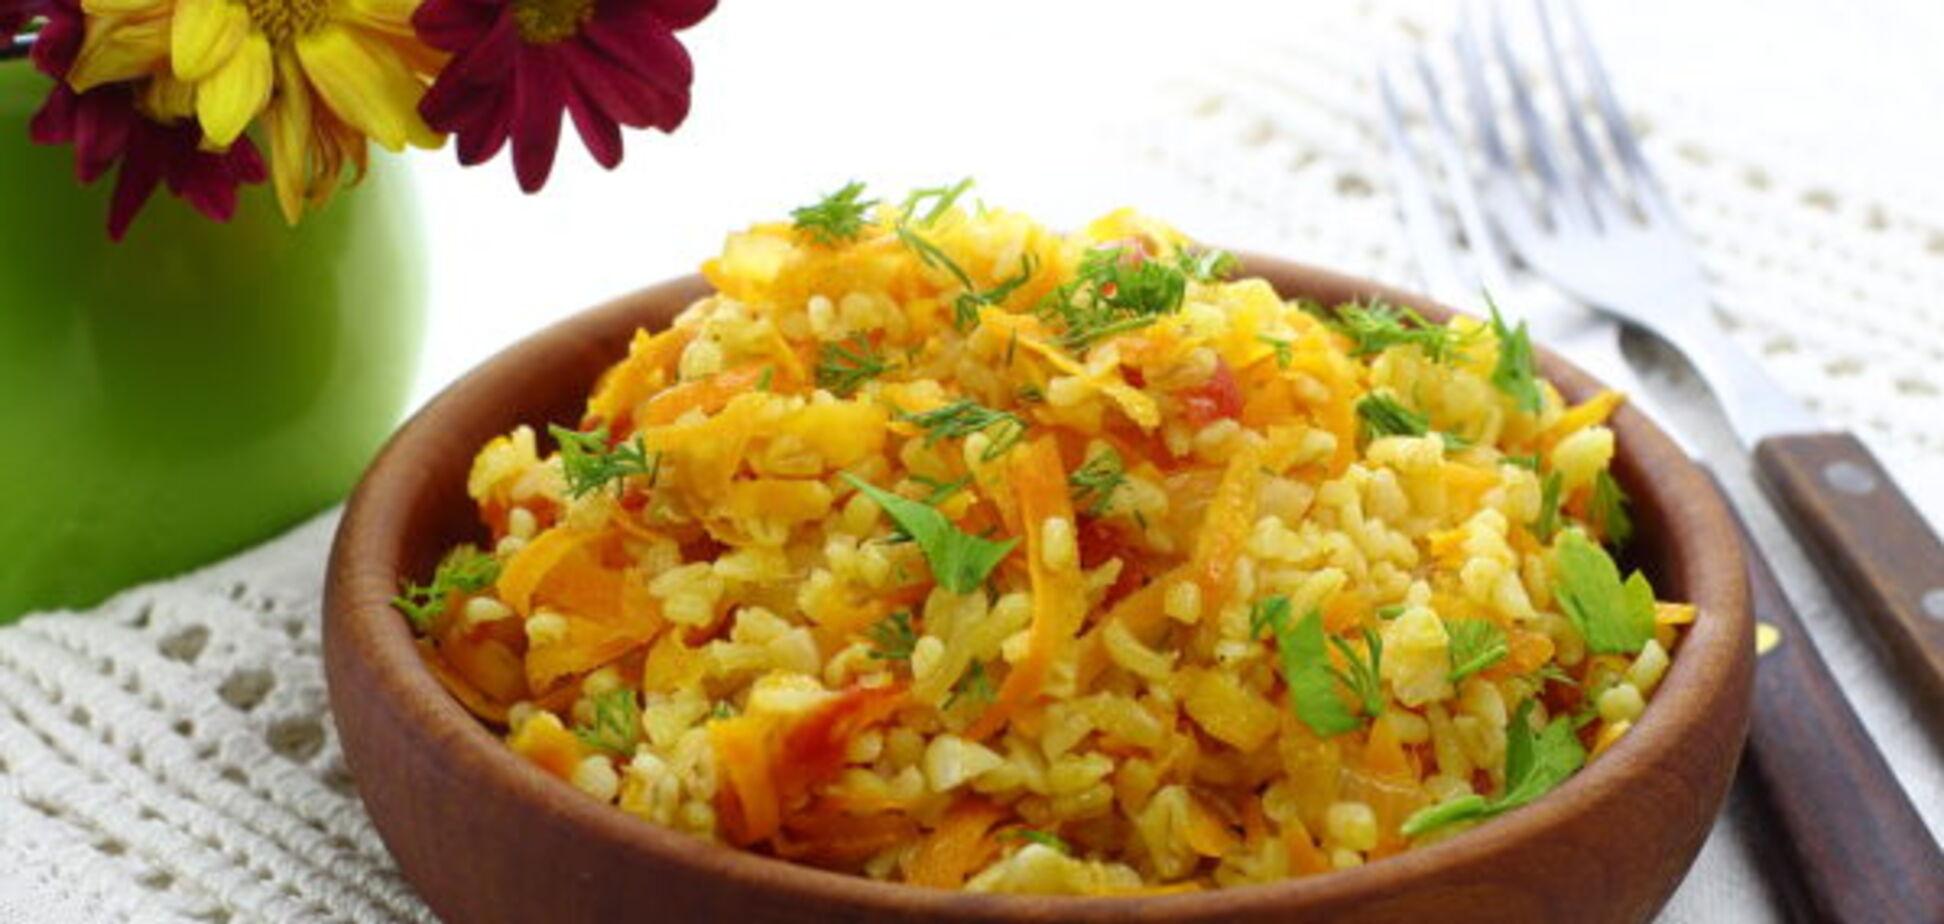 Рецепт ситної та дуже смачної страви з булгура